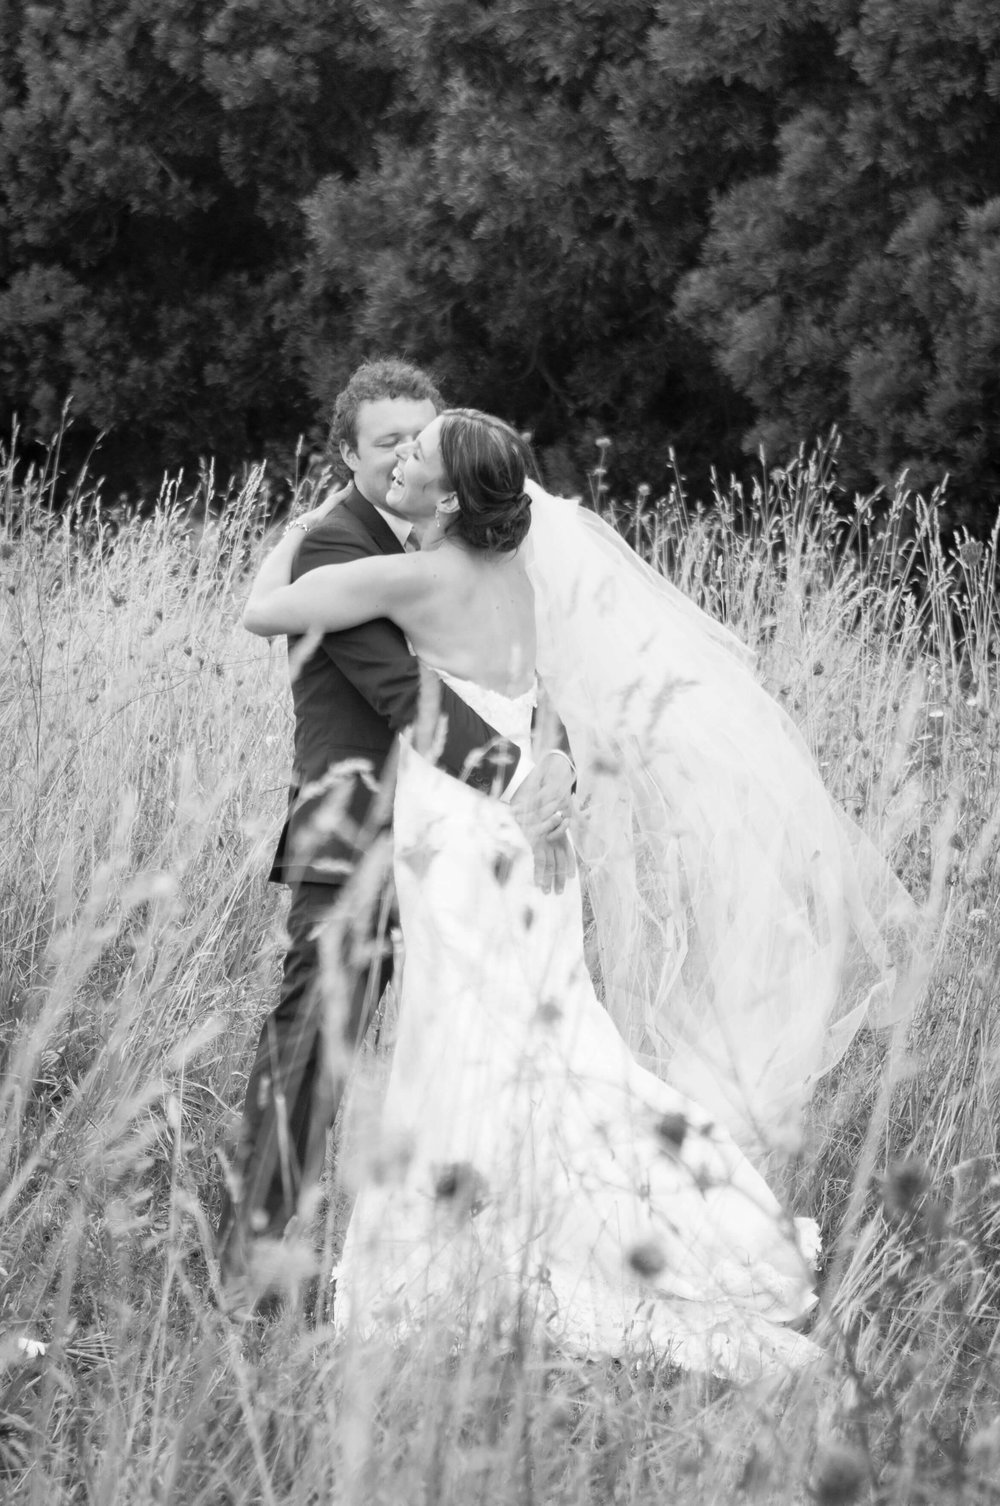 bride-and-groom-in-field-outdoor-wedding-hampshire.jpg